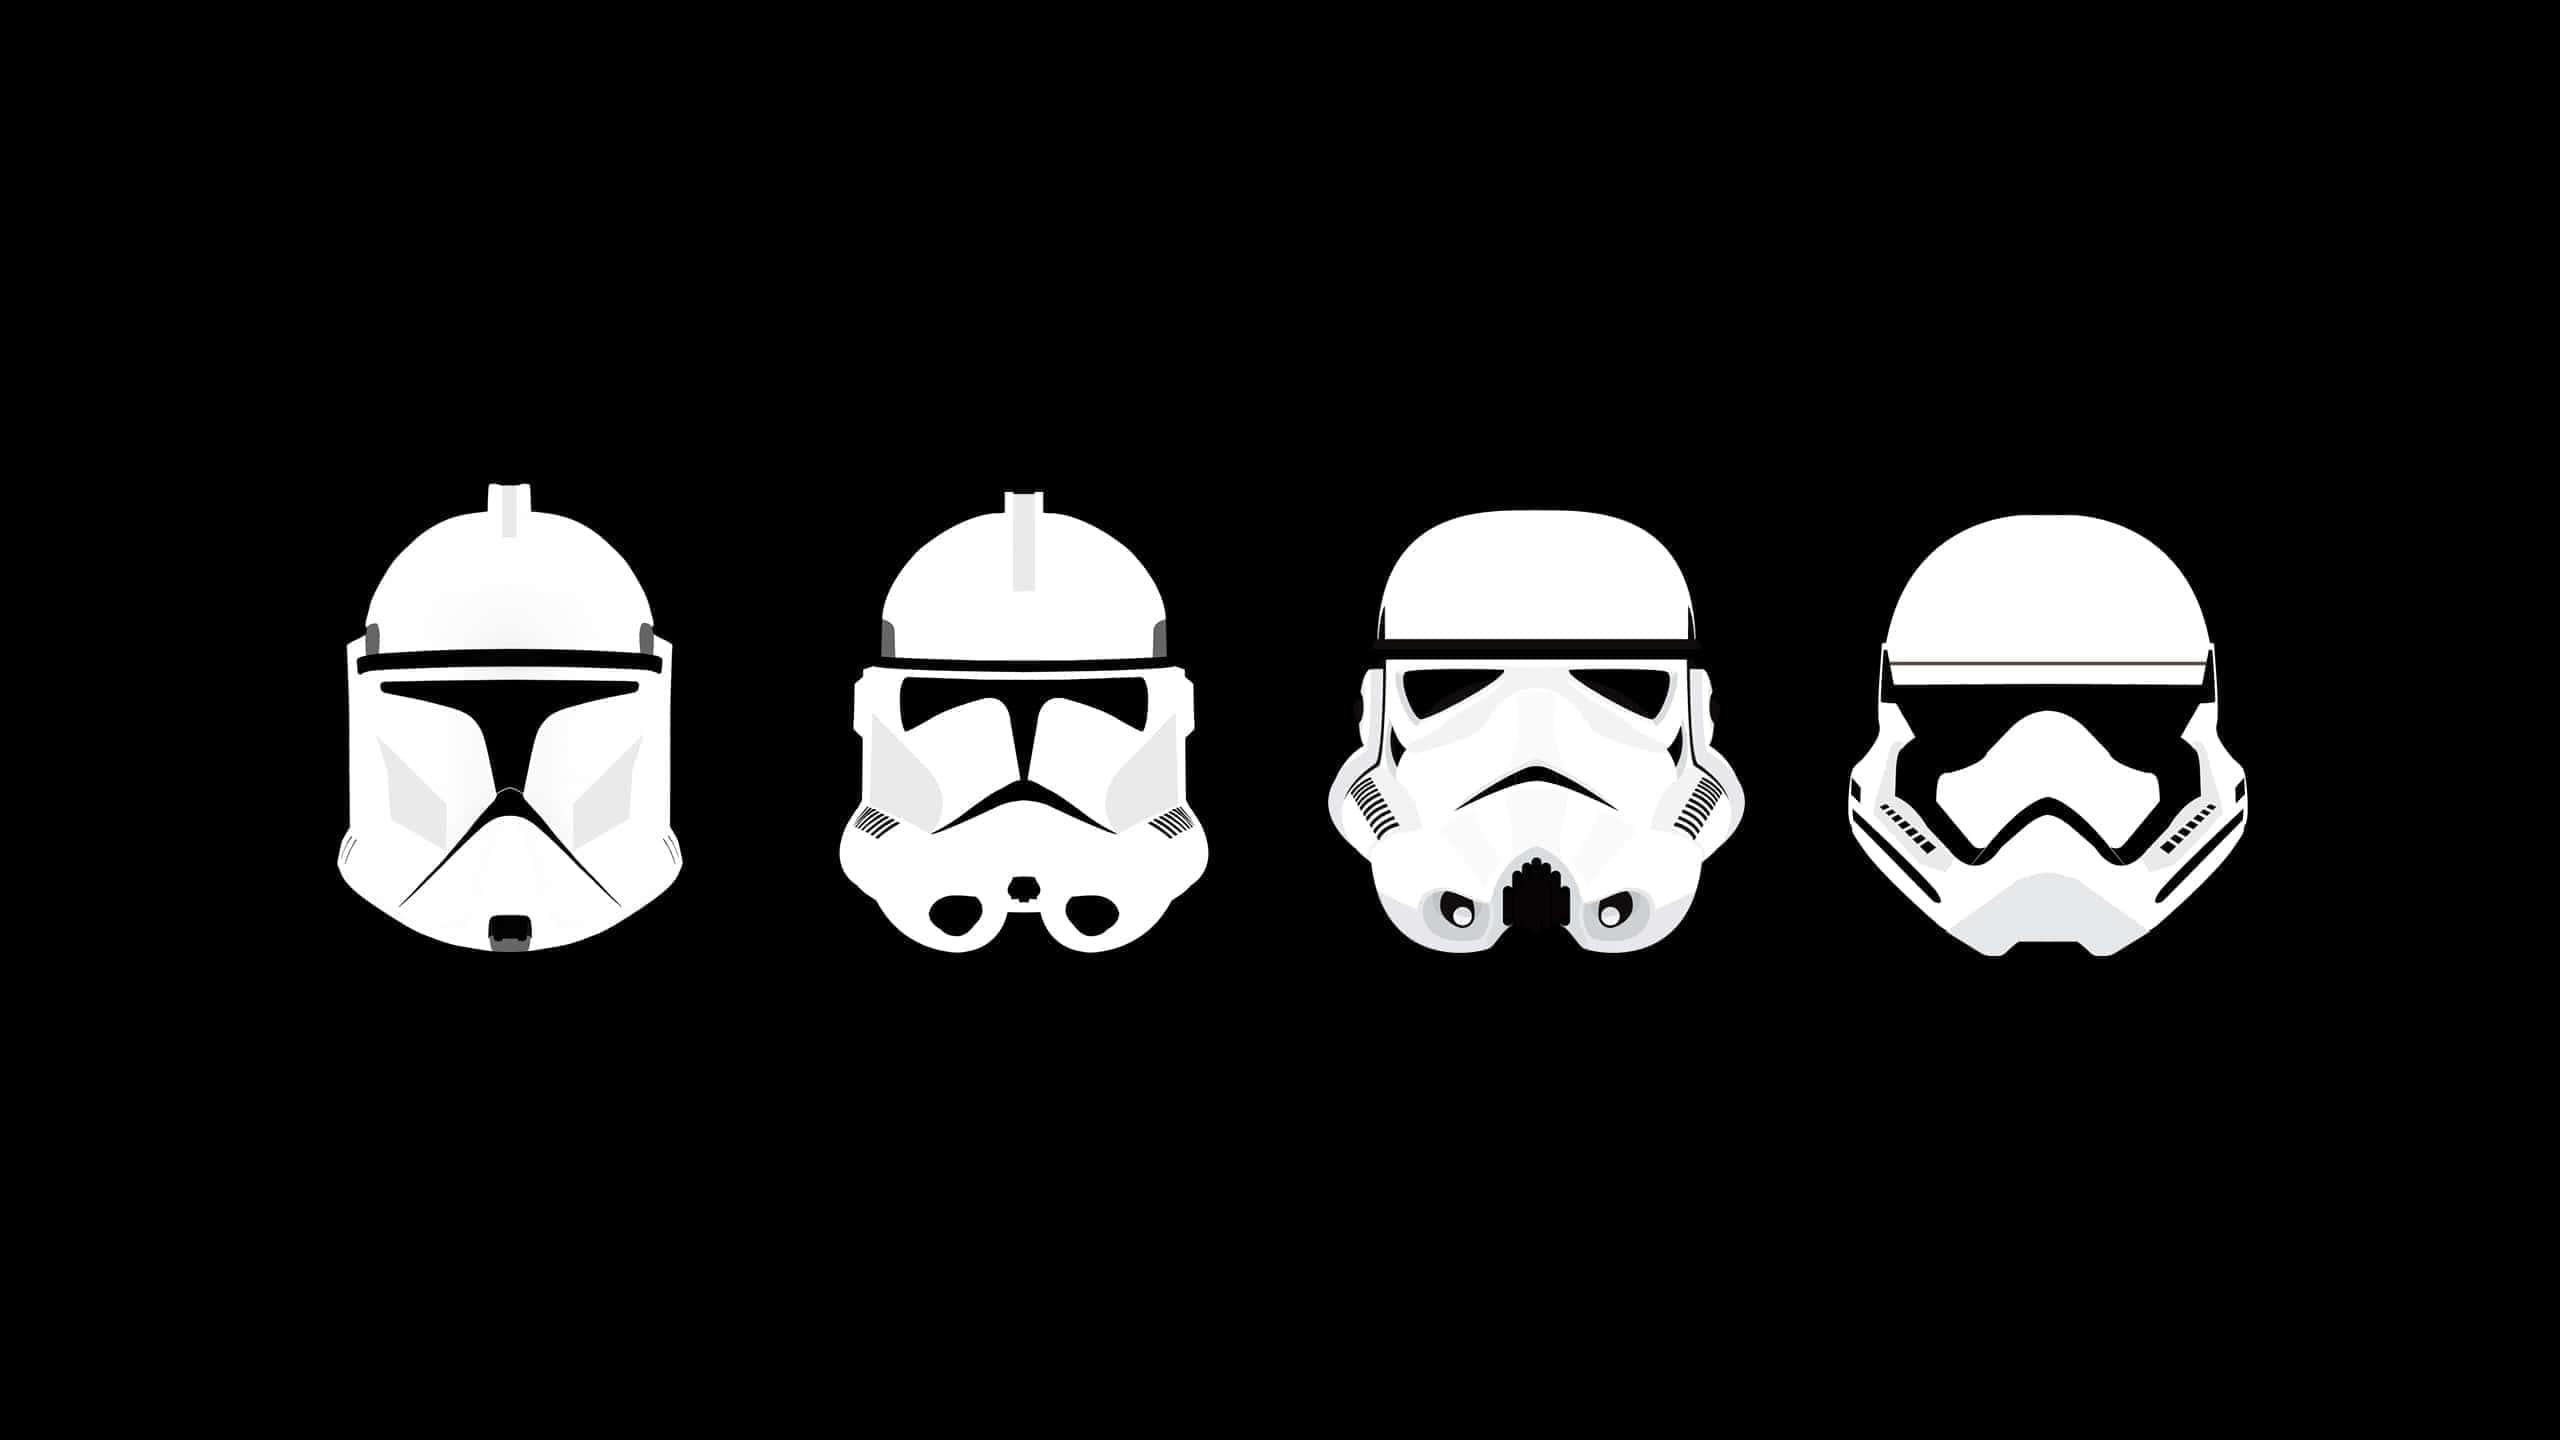 Cars Hd Mobile Wallpapers Star Wars Trooper Evolution Wqhd 1440p Wallpaper Pixelz